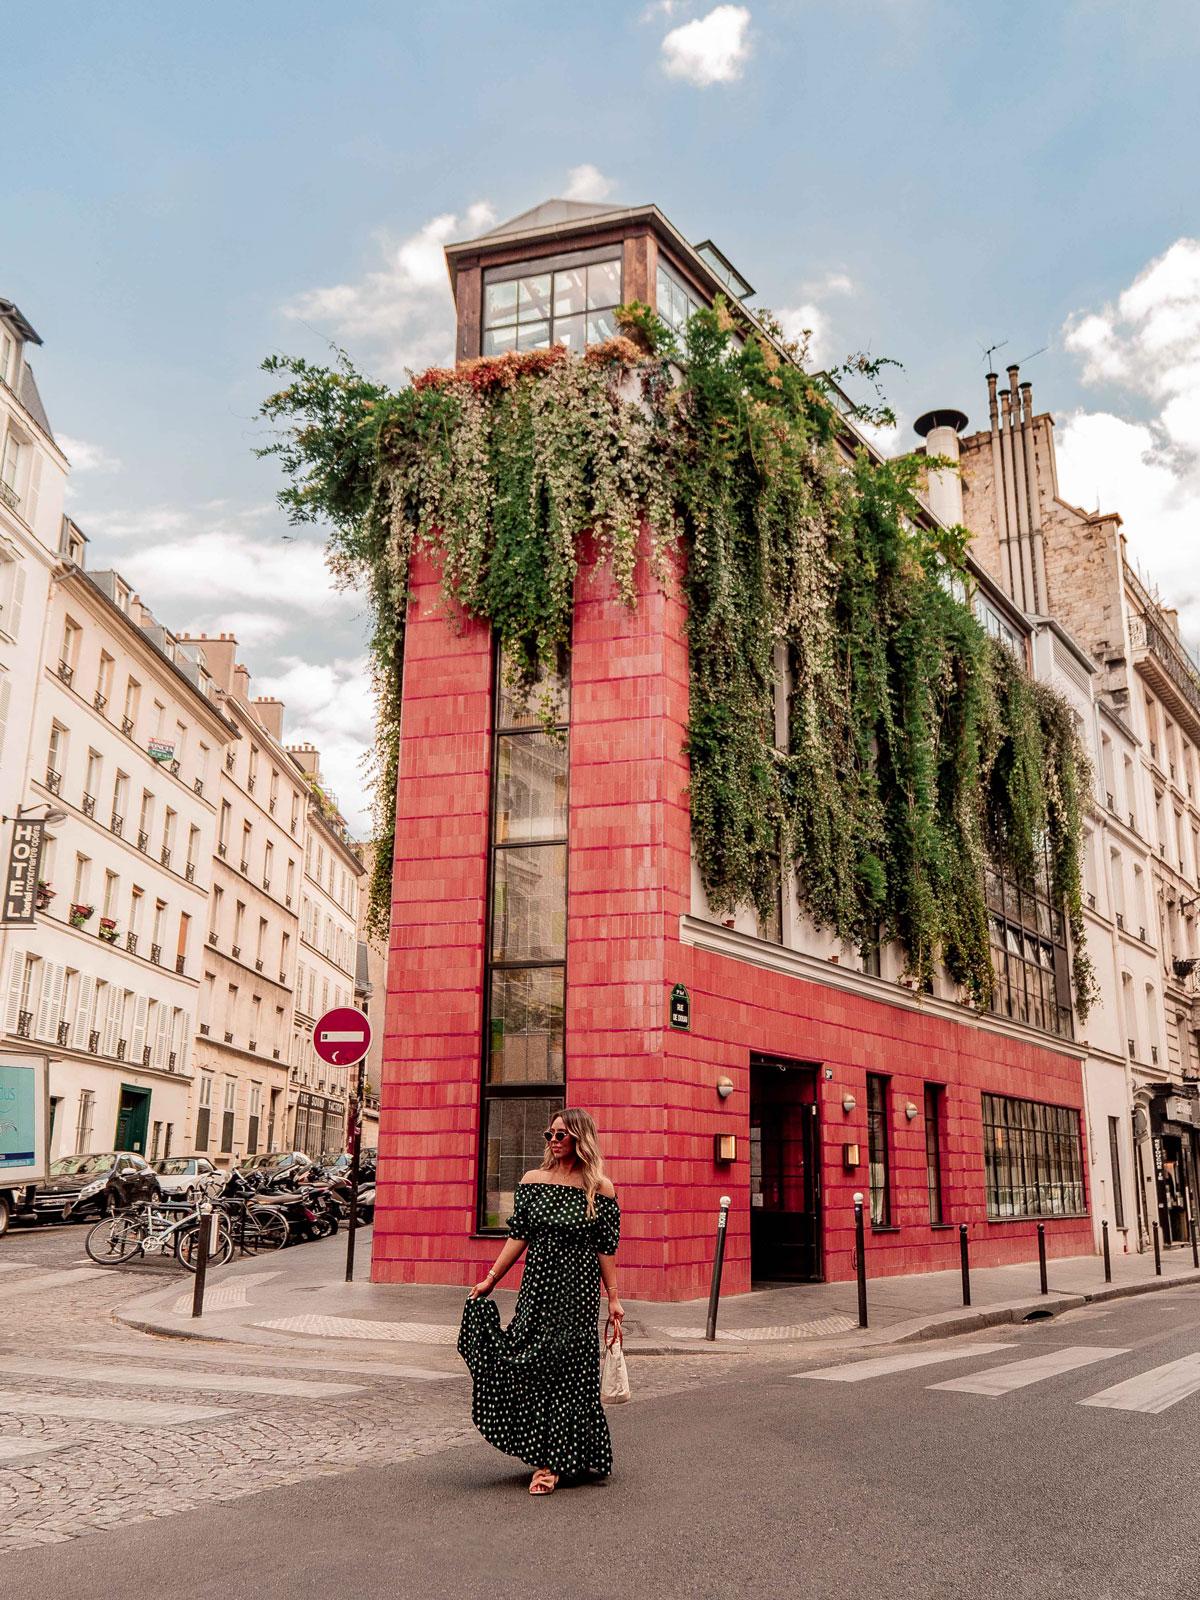 20 Best Paris Photography Locations Instagram Spots Pink Mamma @kelseyinlondon Kelsey Heinrichs